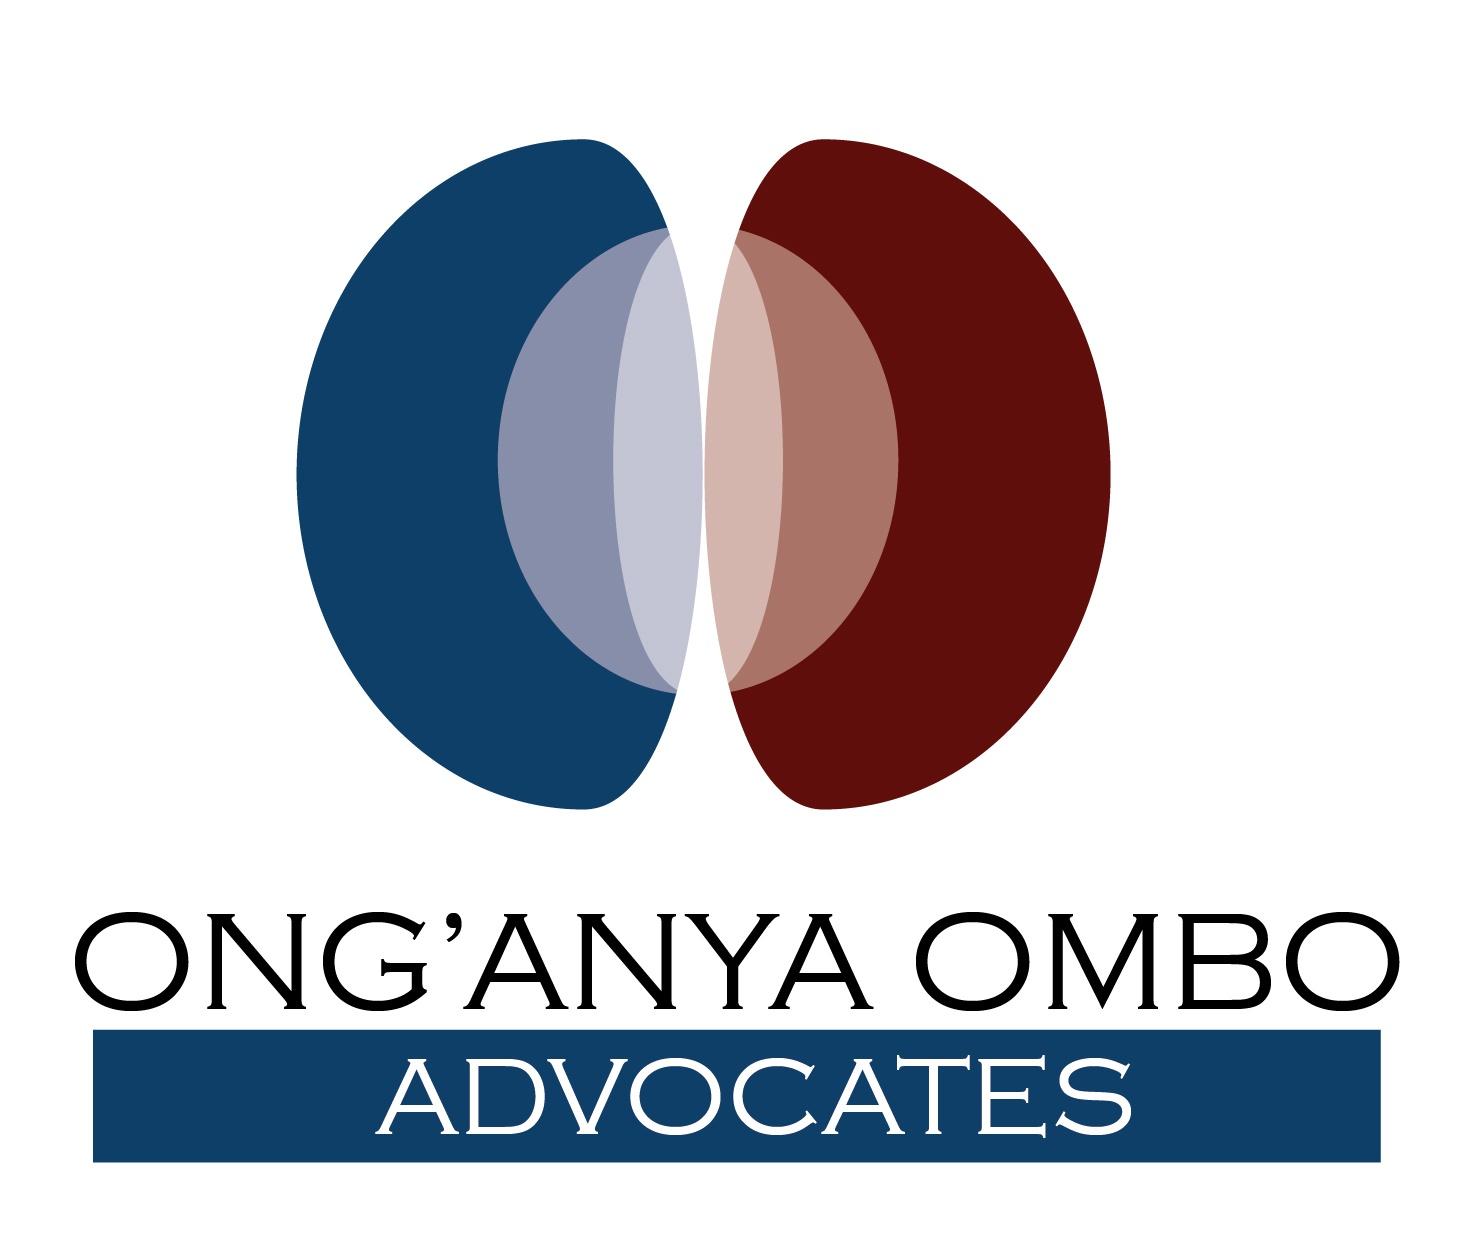 Ong'anya Ombo Advocates